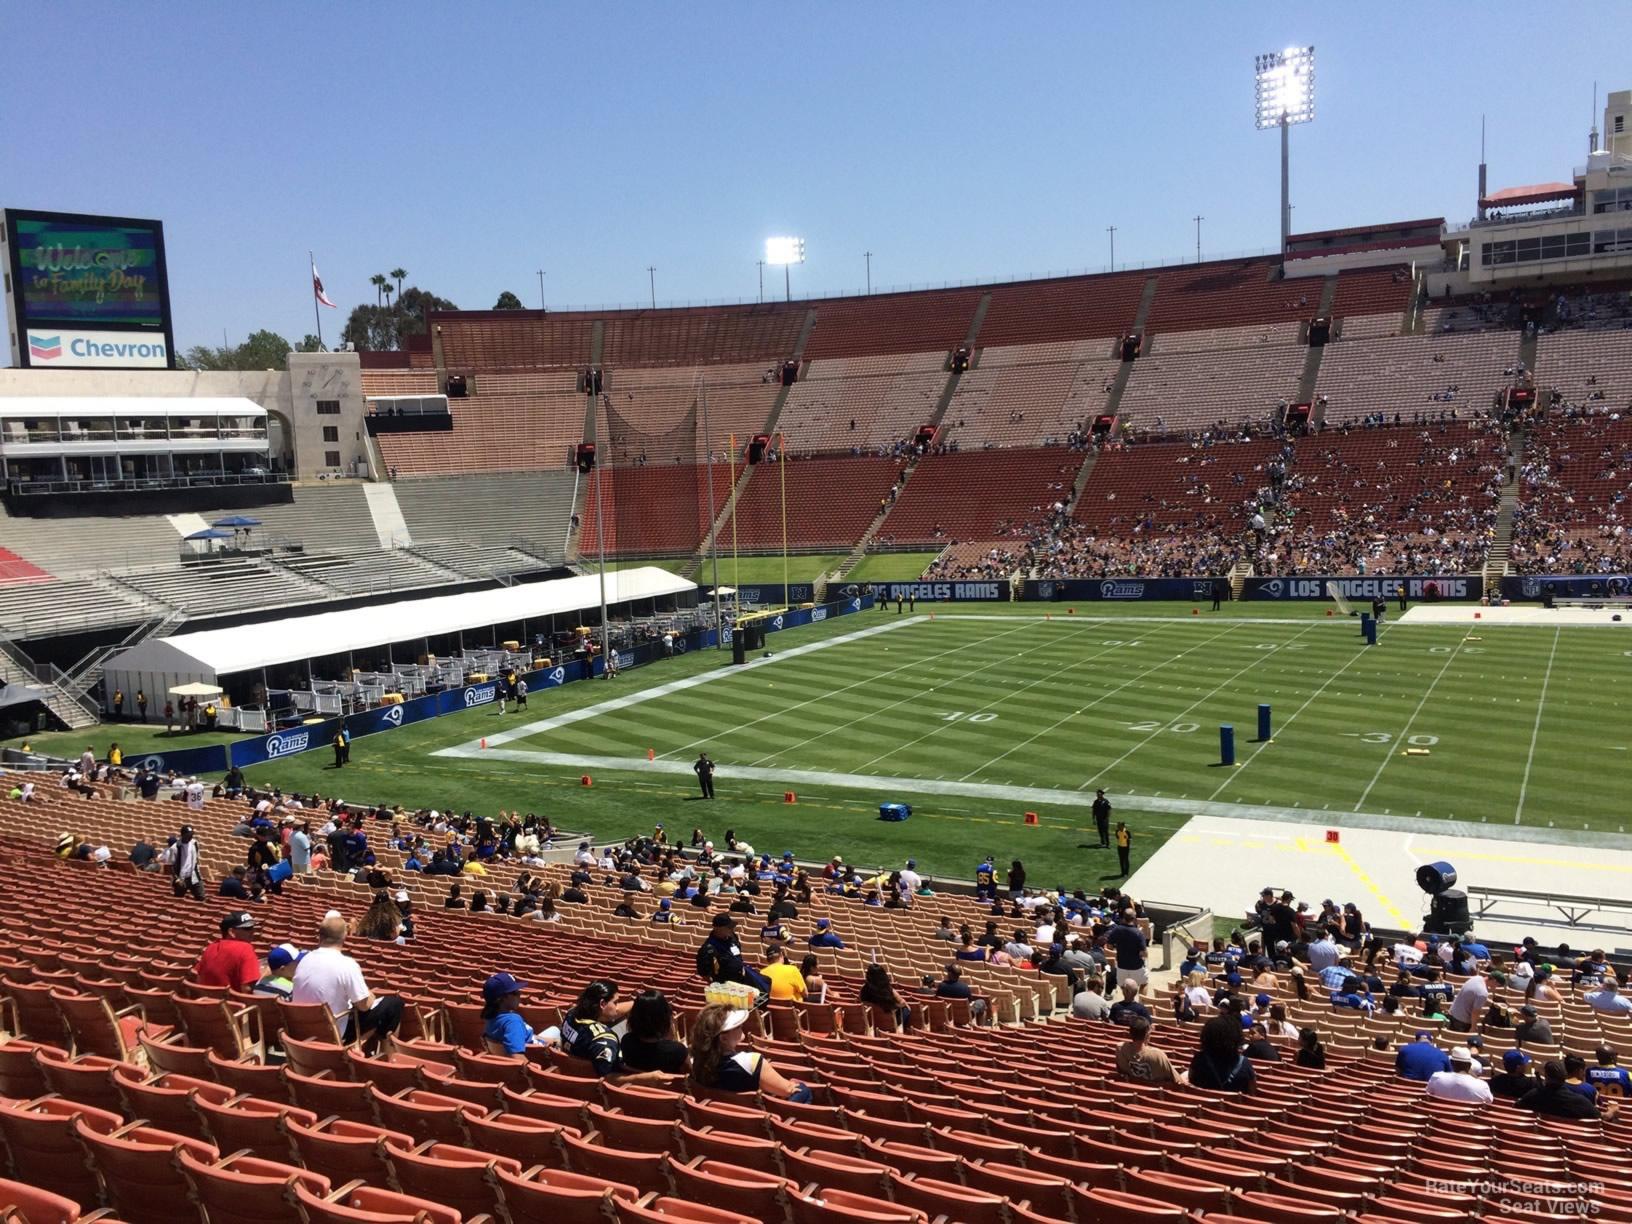 Los Angeles Memorial Coliseum Section 23 - RateYourSeats.com